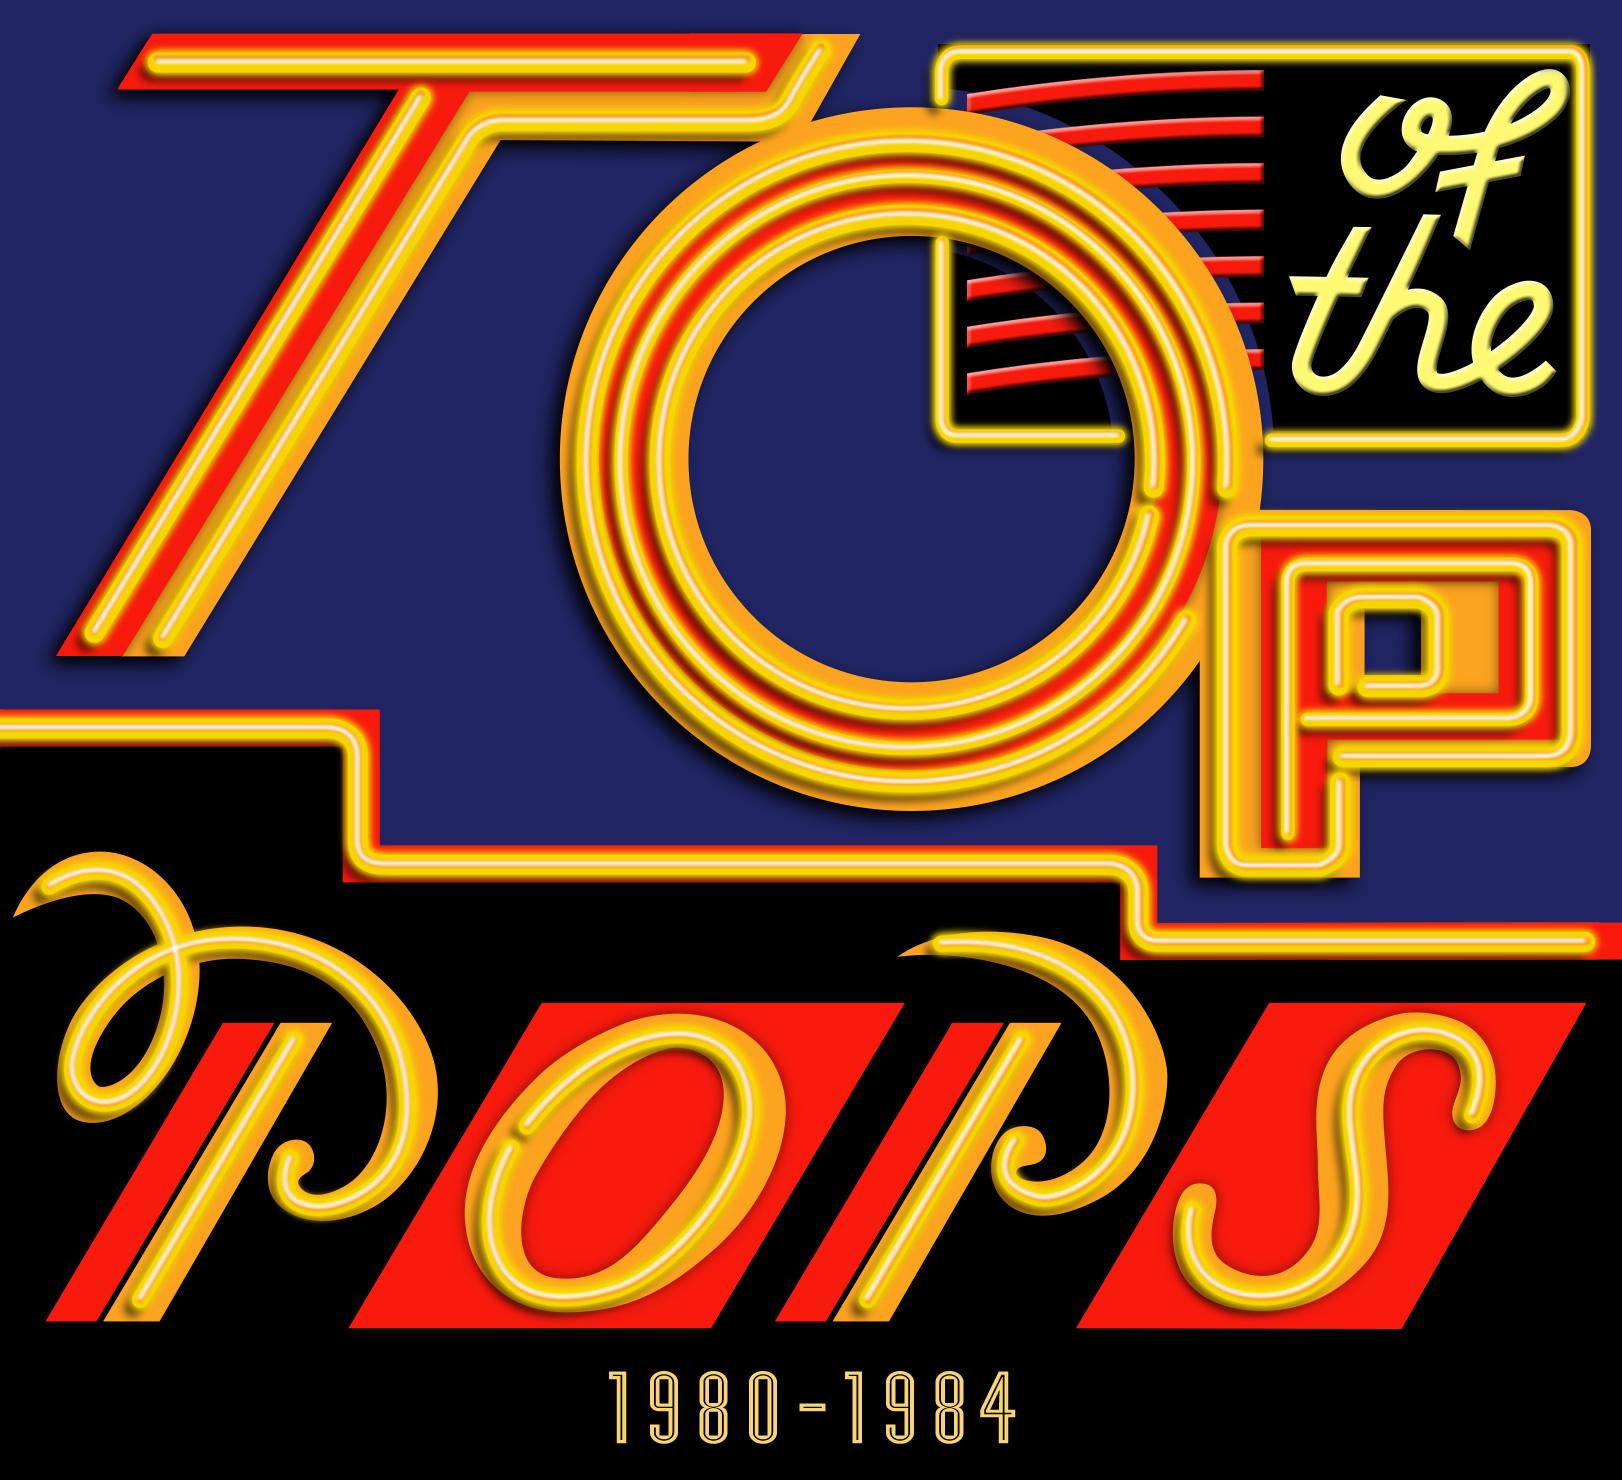 TOTP 1980-1984